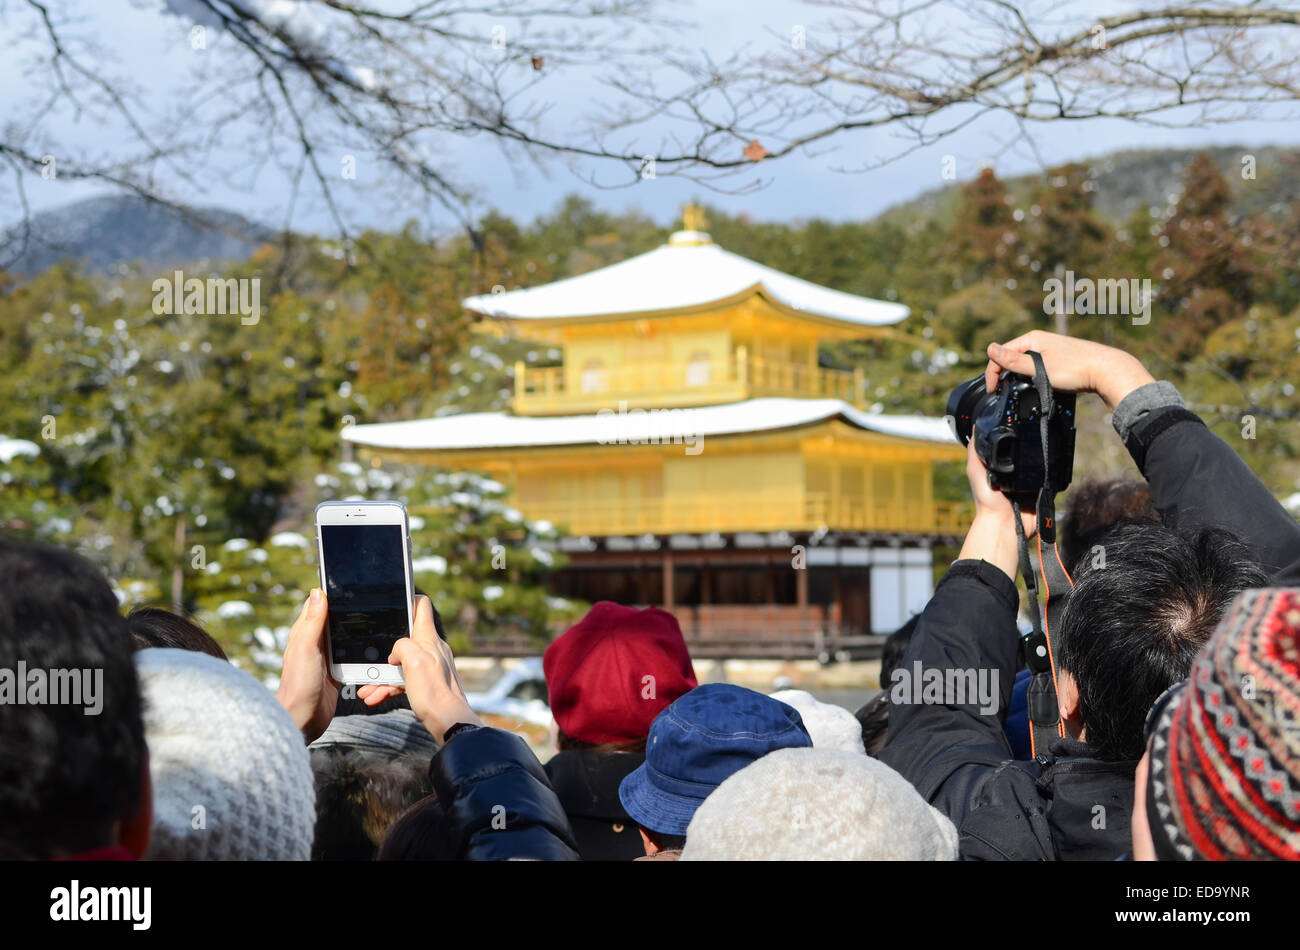 Tourists at Kinkakuji (Golden Temple / Golden Pavilion) in Kyoto, Japan. - Stock Image